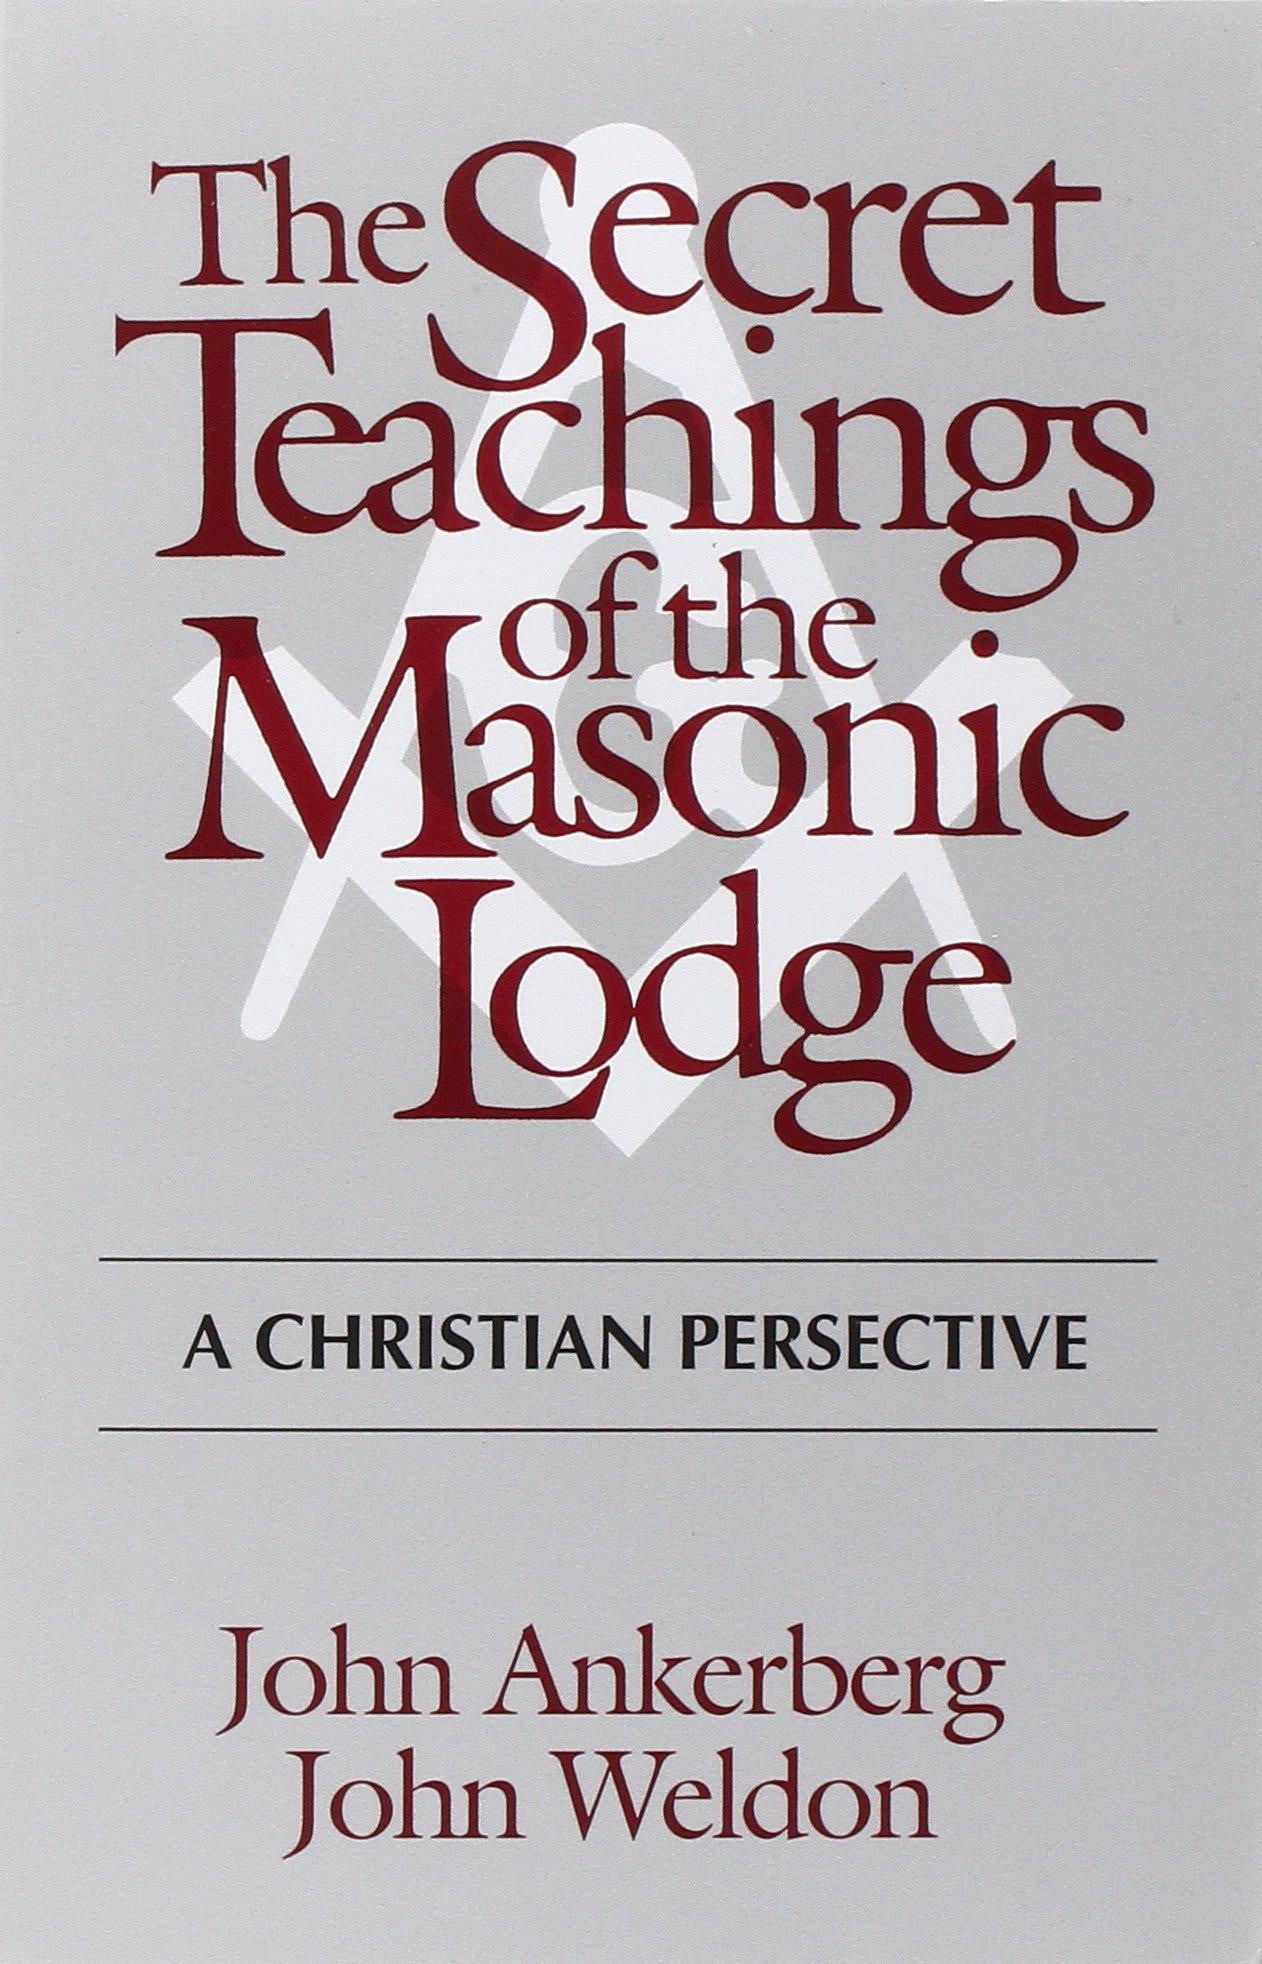 The Secret Teachings of the Masonic Lodge